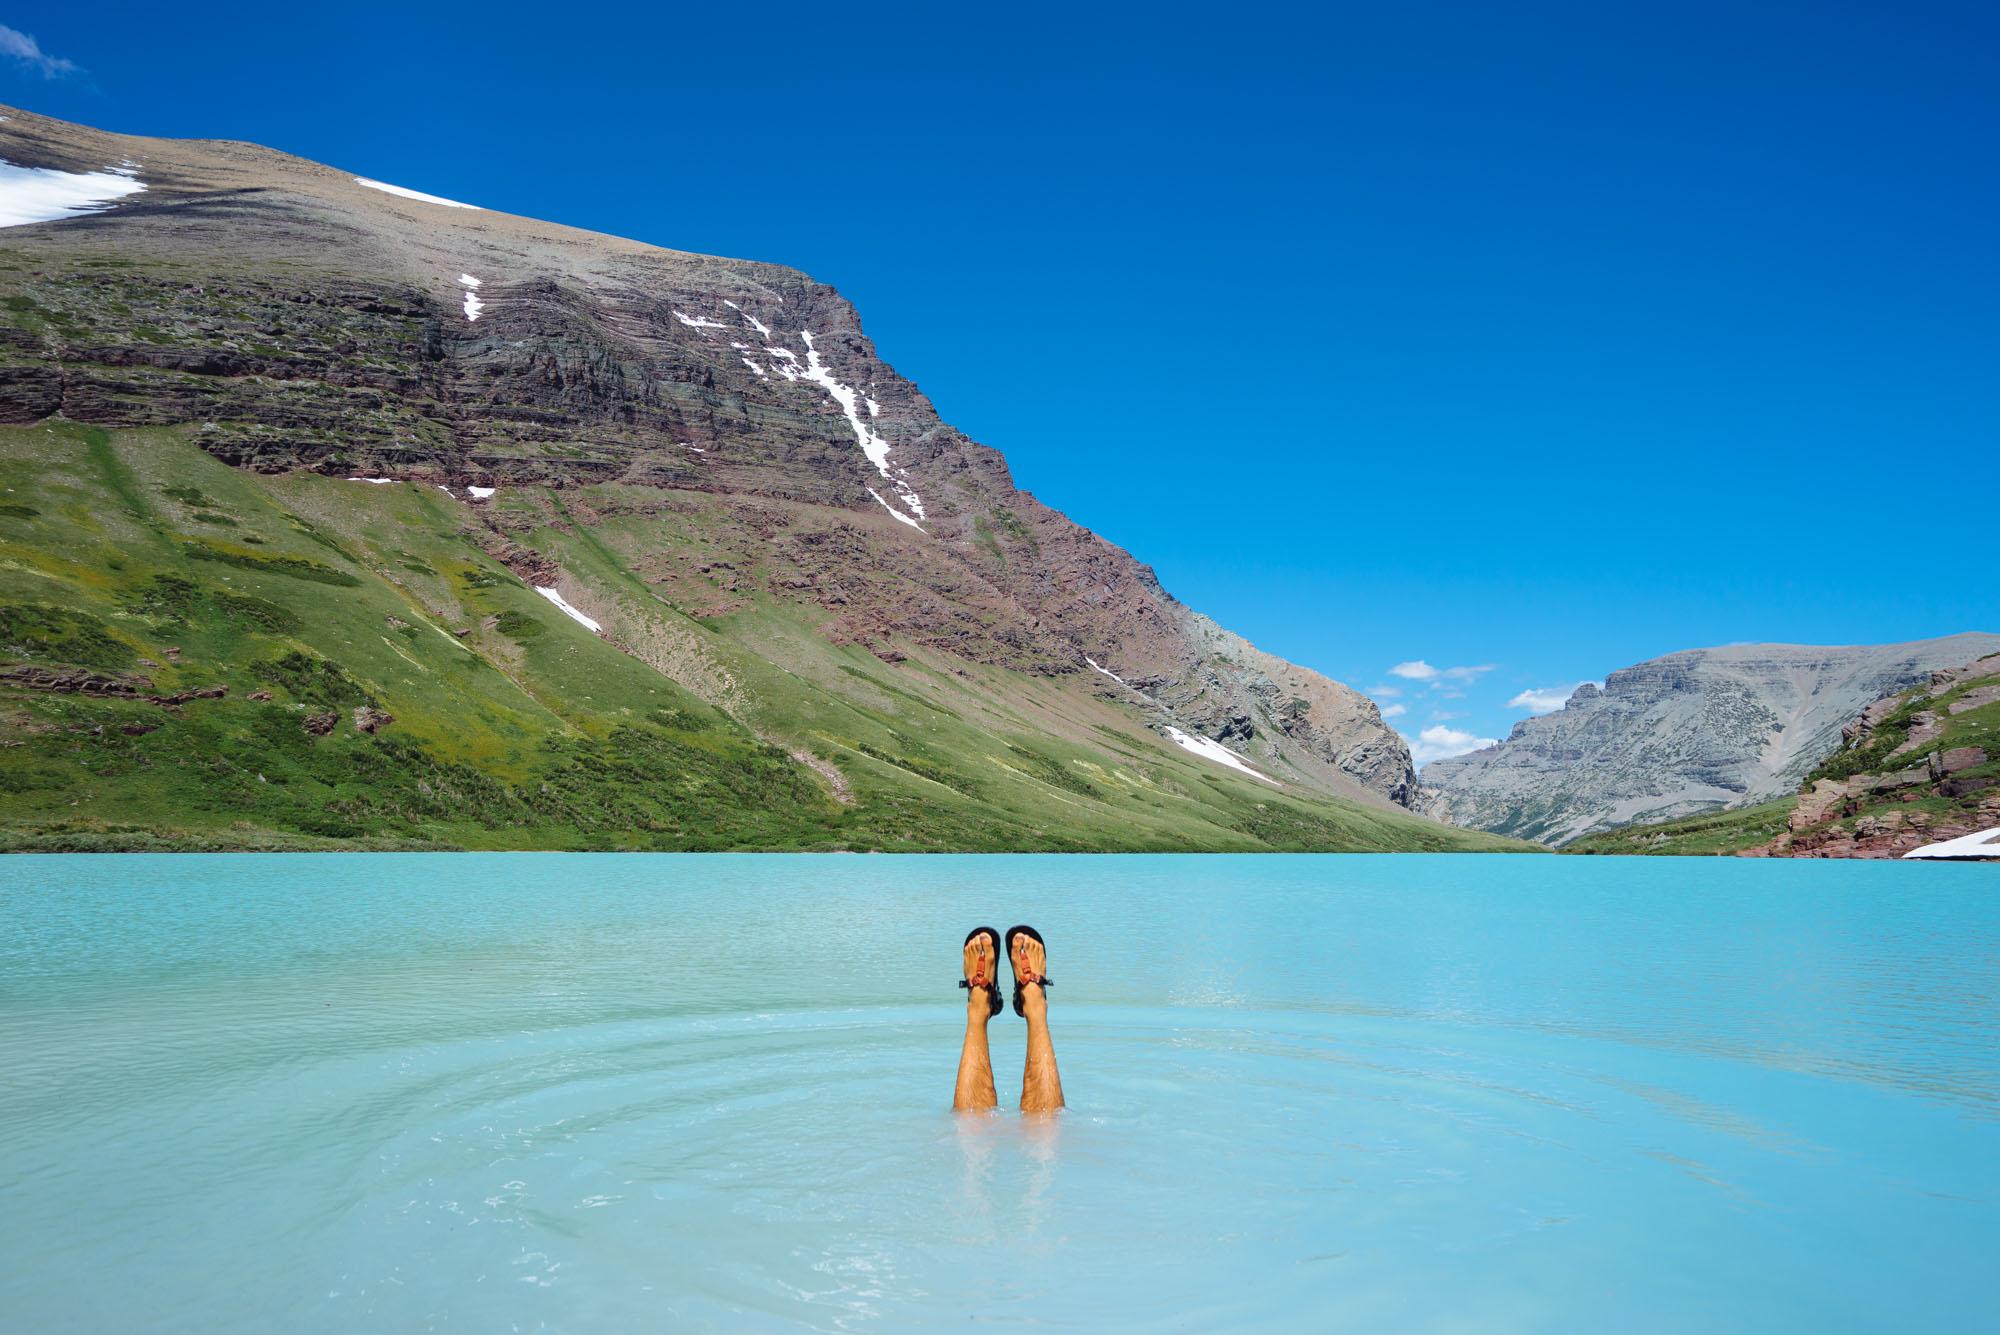 Owen in Cracker Lake, Glacier NP